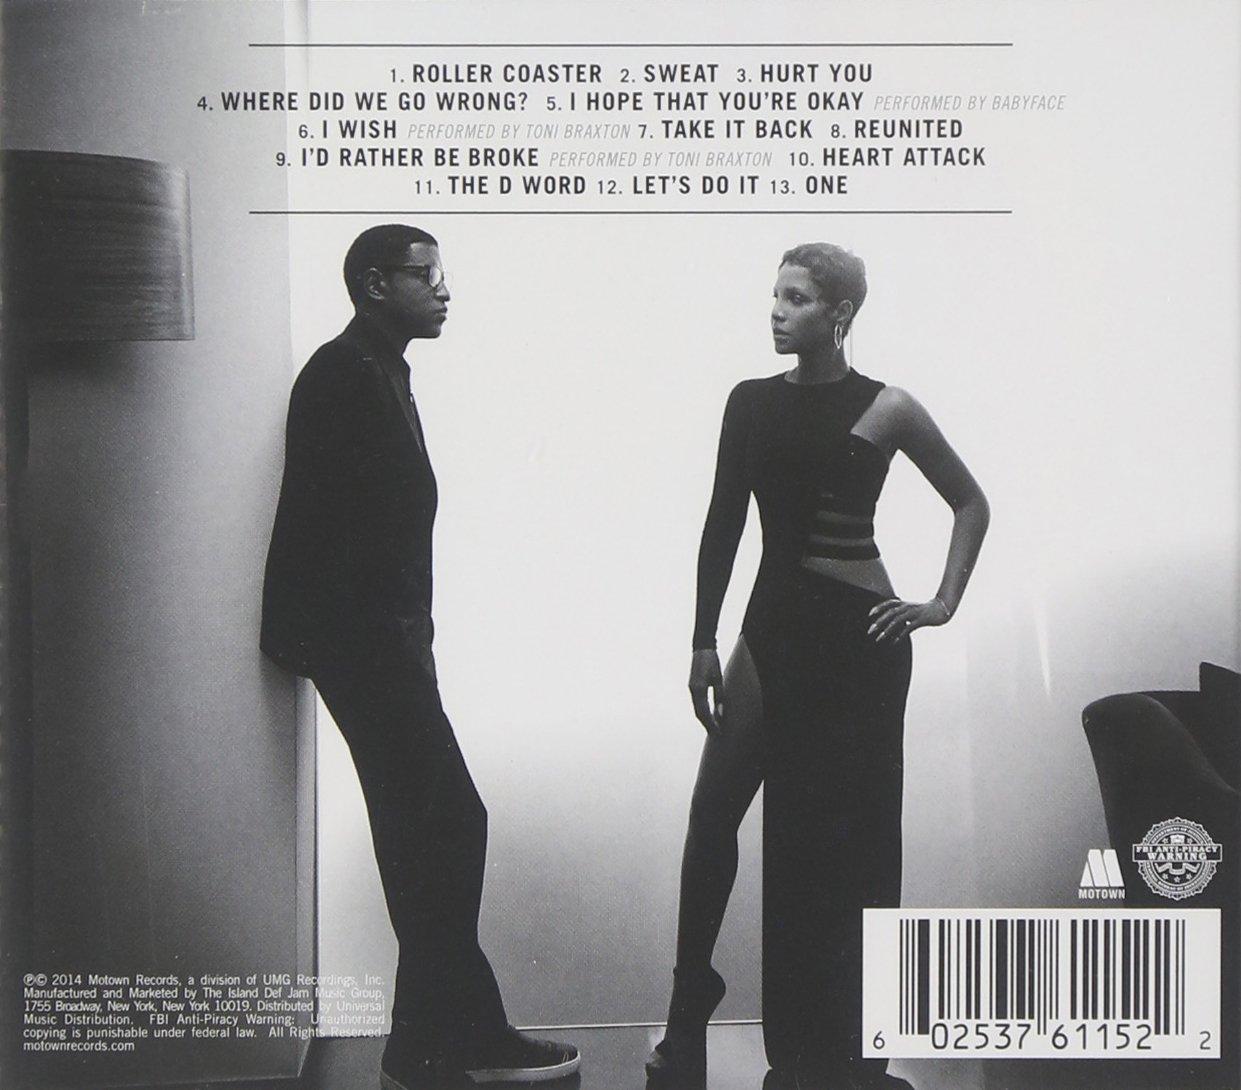 Fshare] - Toni Braxton & Babyface – Love, Marriage & Divorce (2014